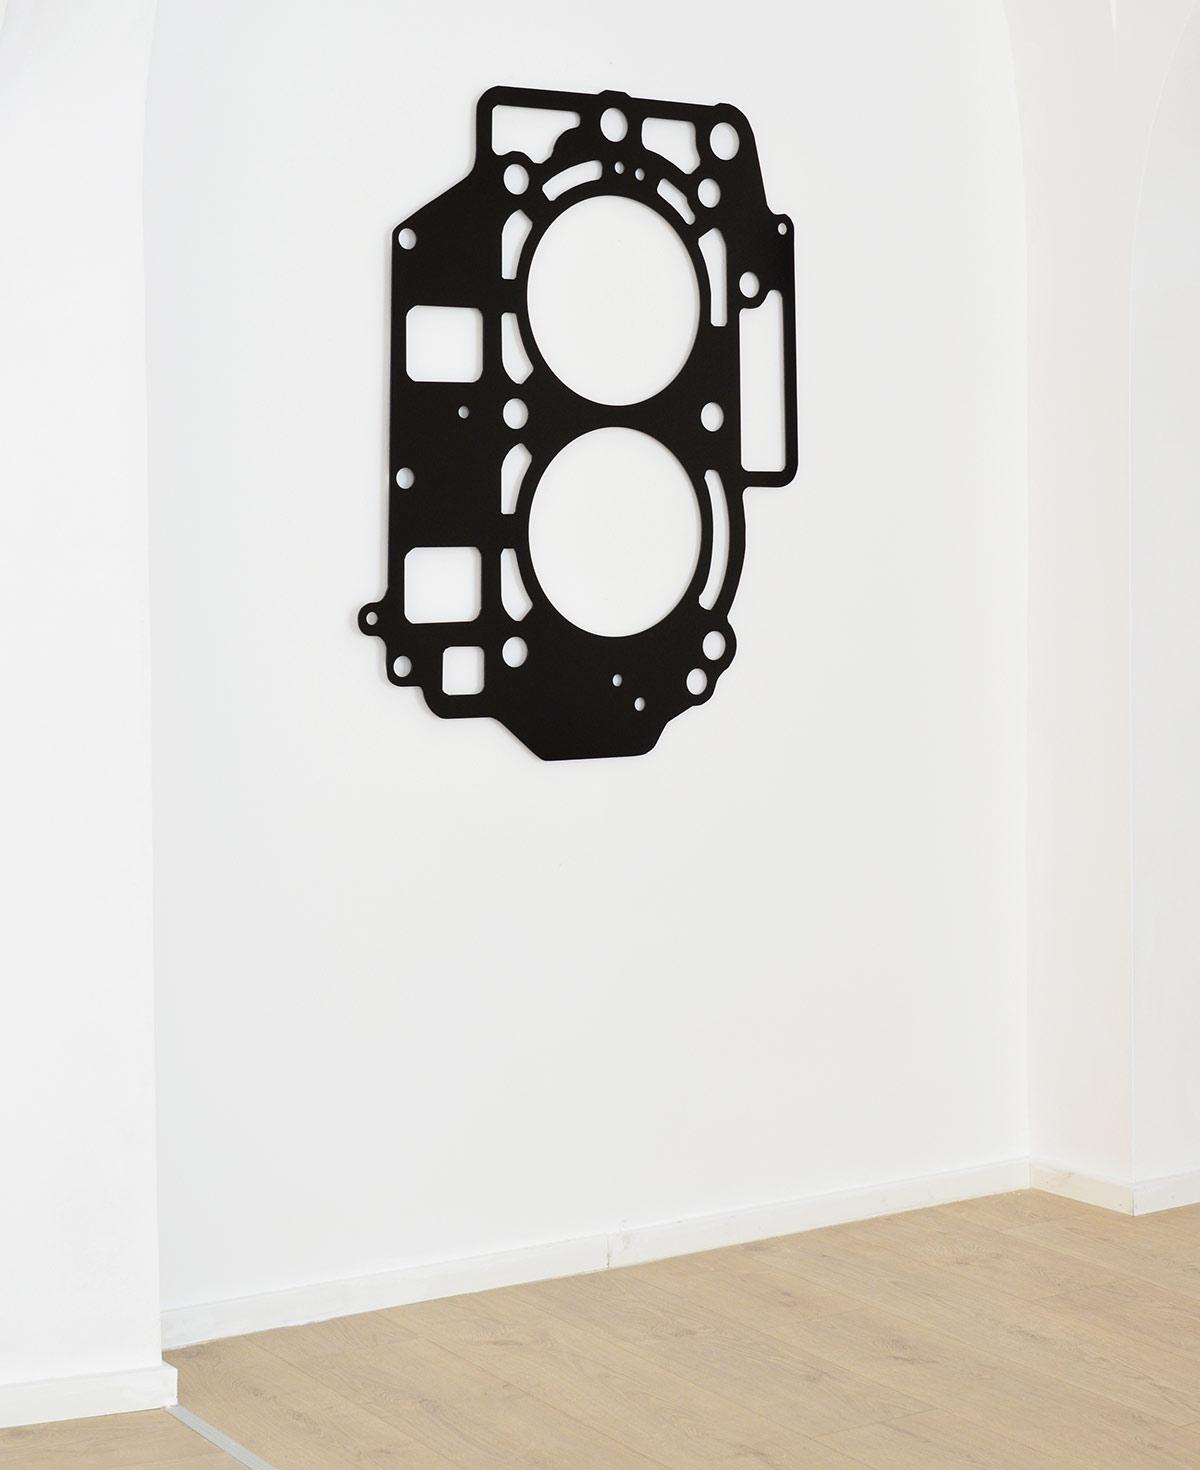 binary, yield, point, catalysator, artwork, contemporary artists, vienna, desiderio , galleries in vienna, viewing room